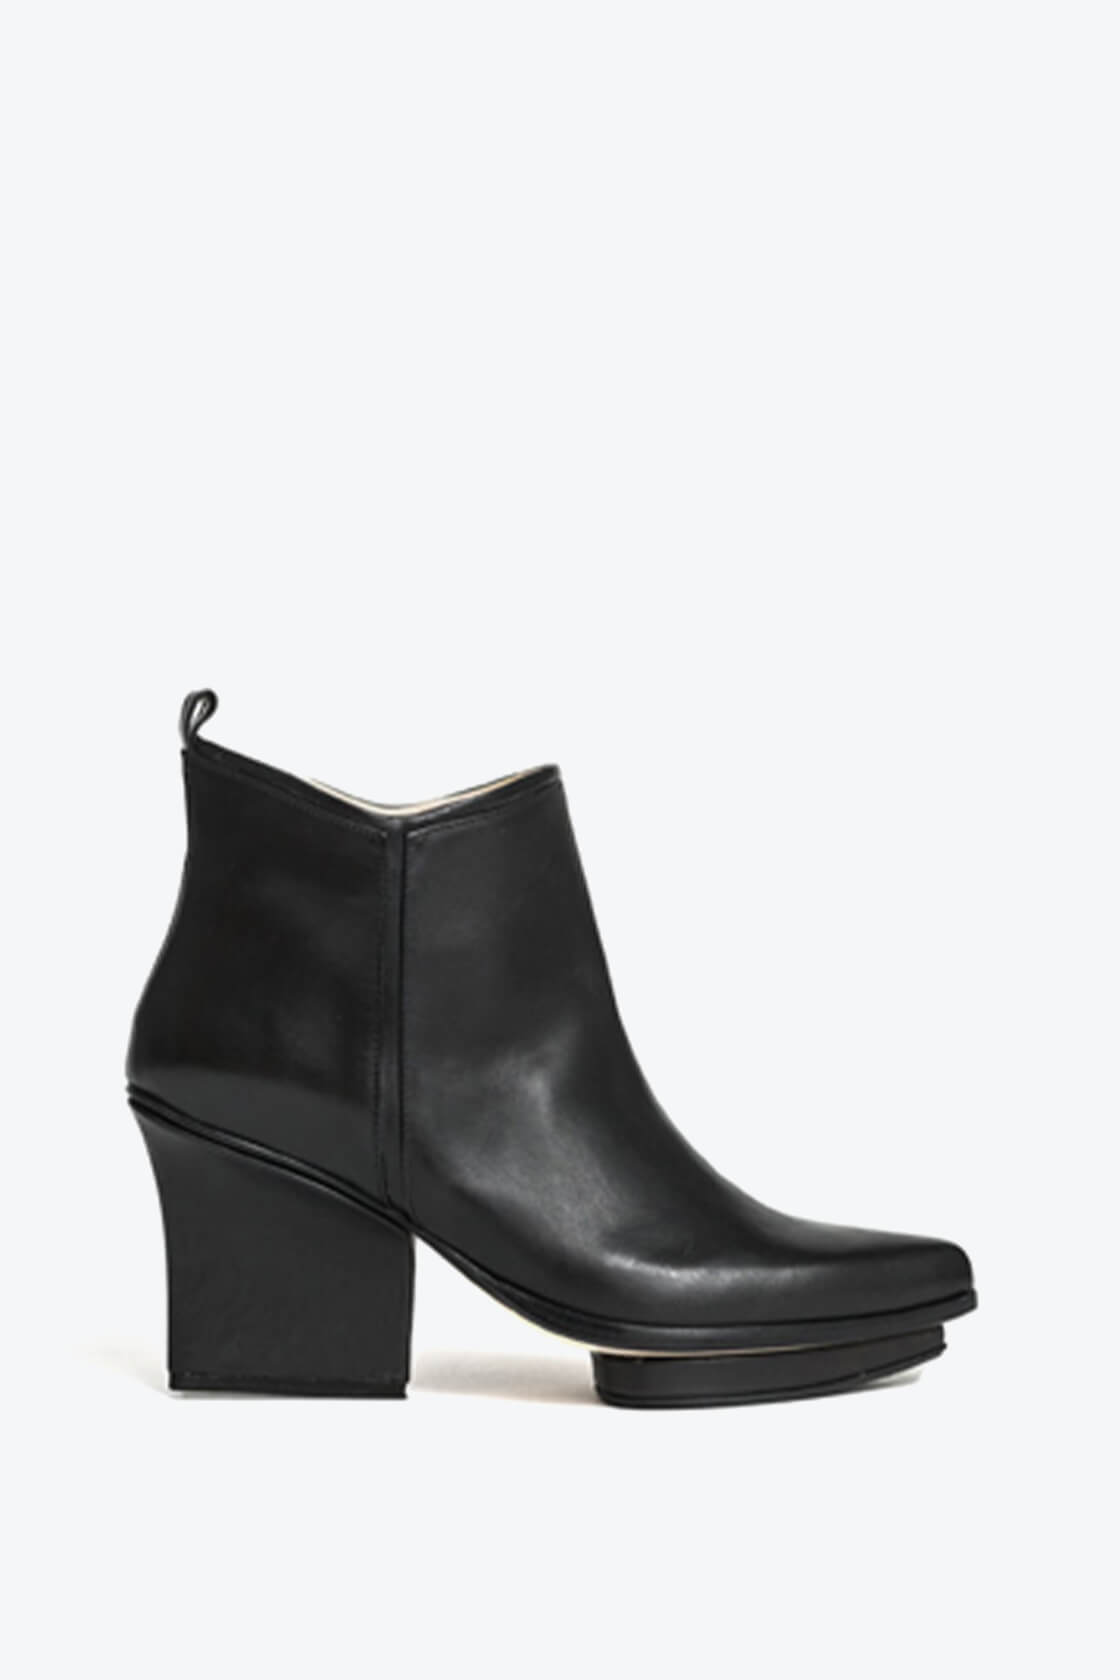 EJK0000078 Glenn ankle boots black 1